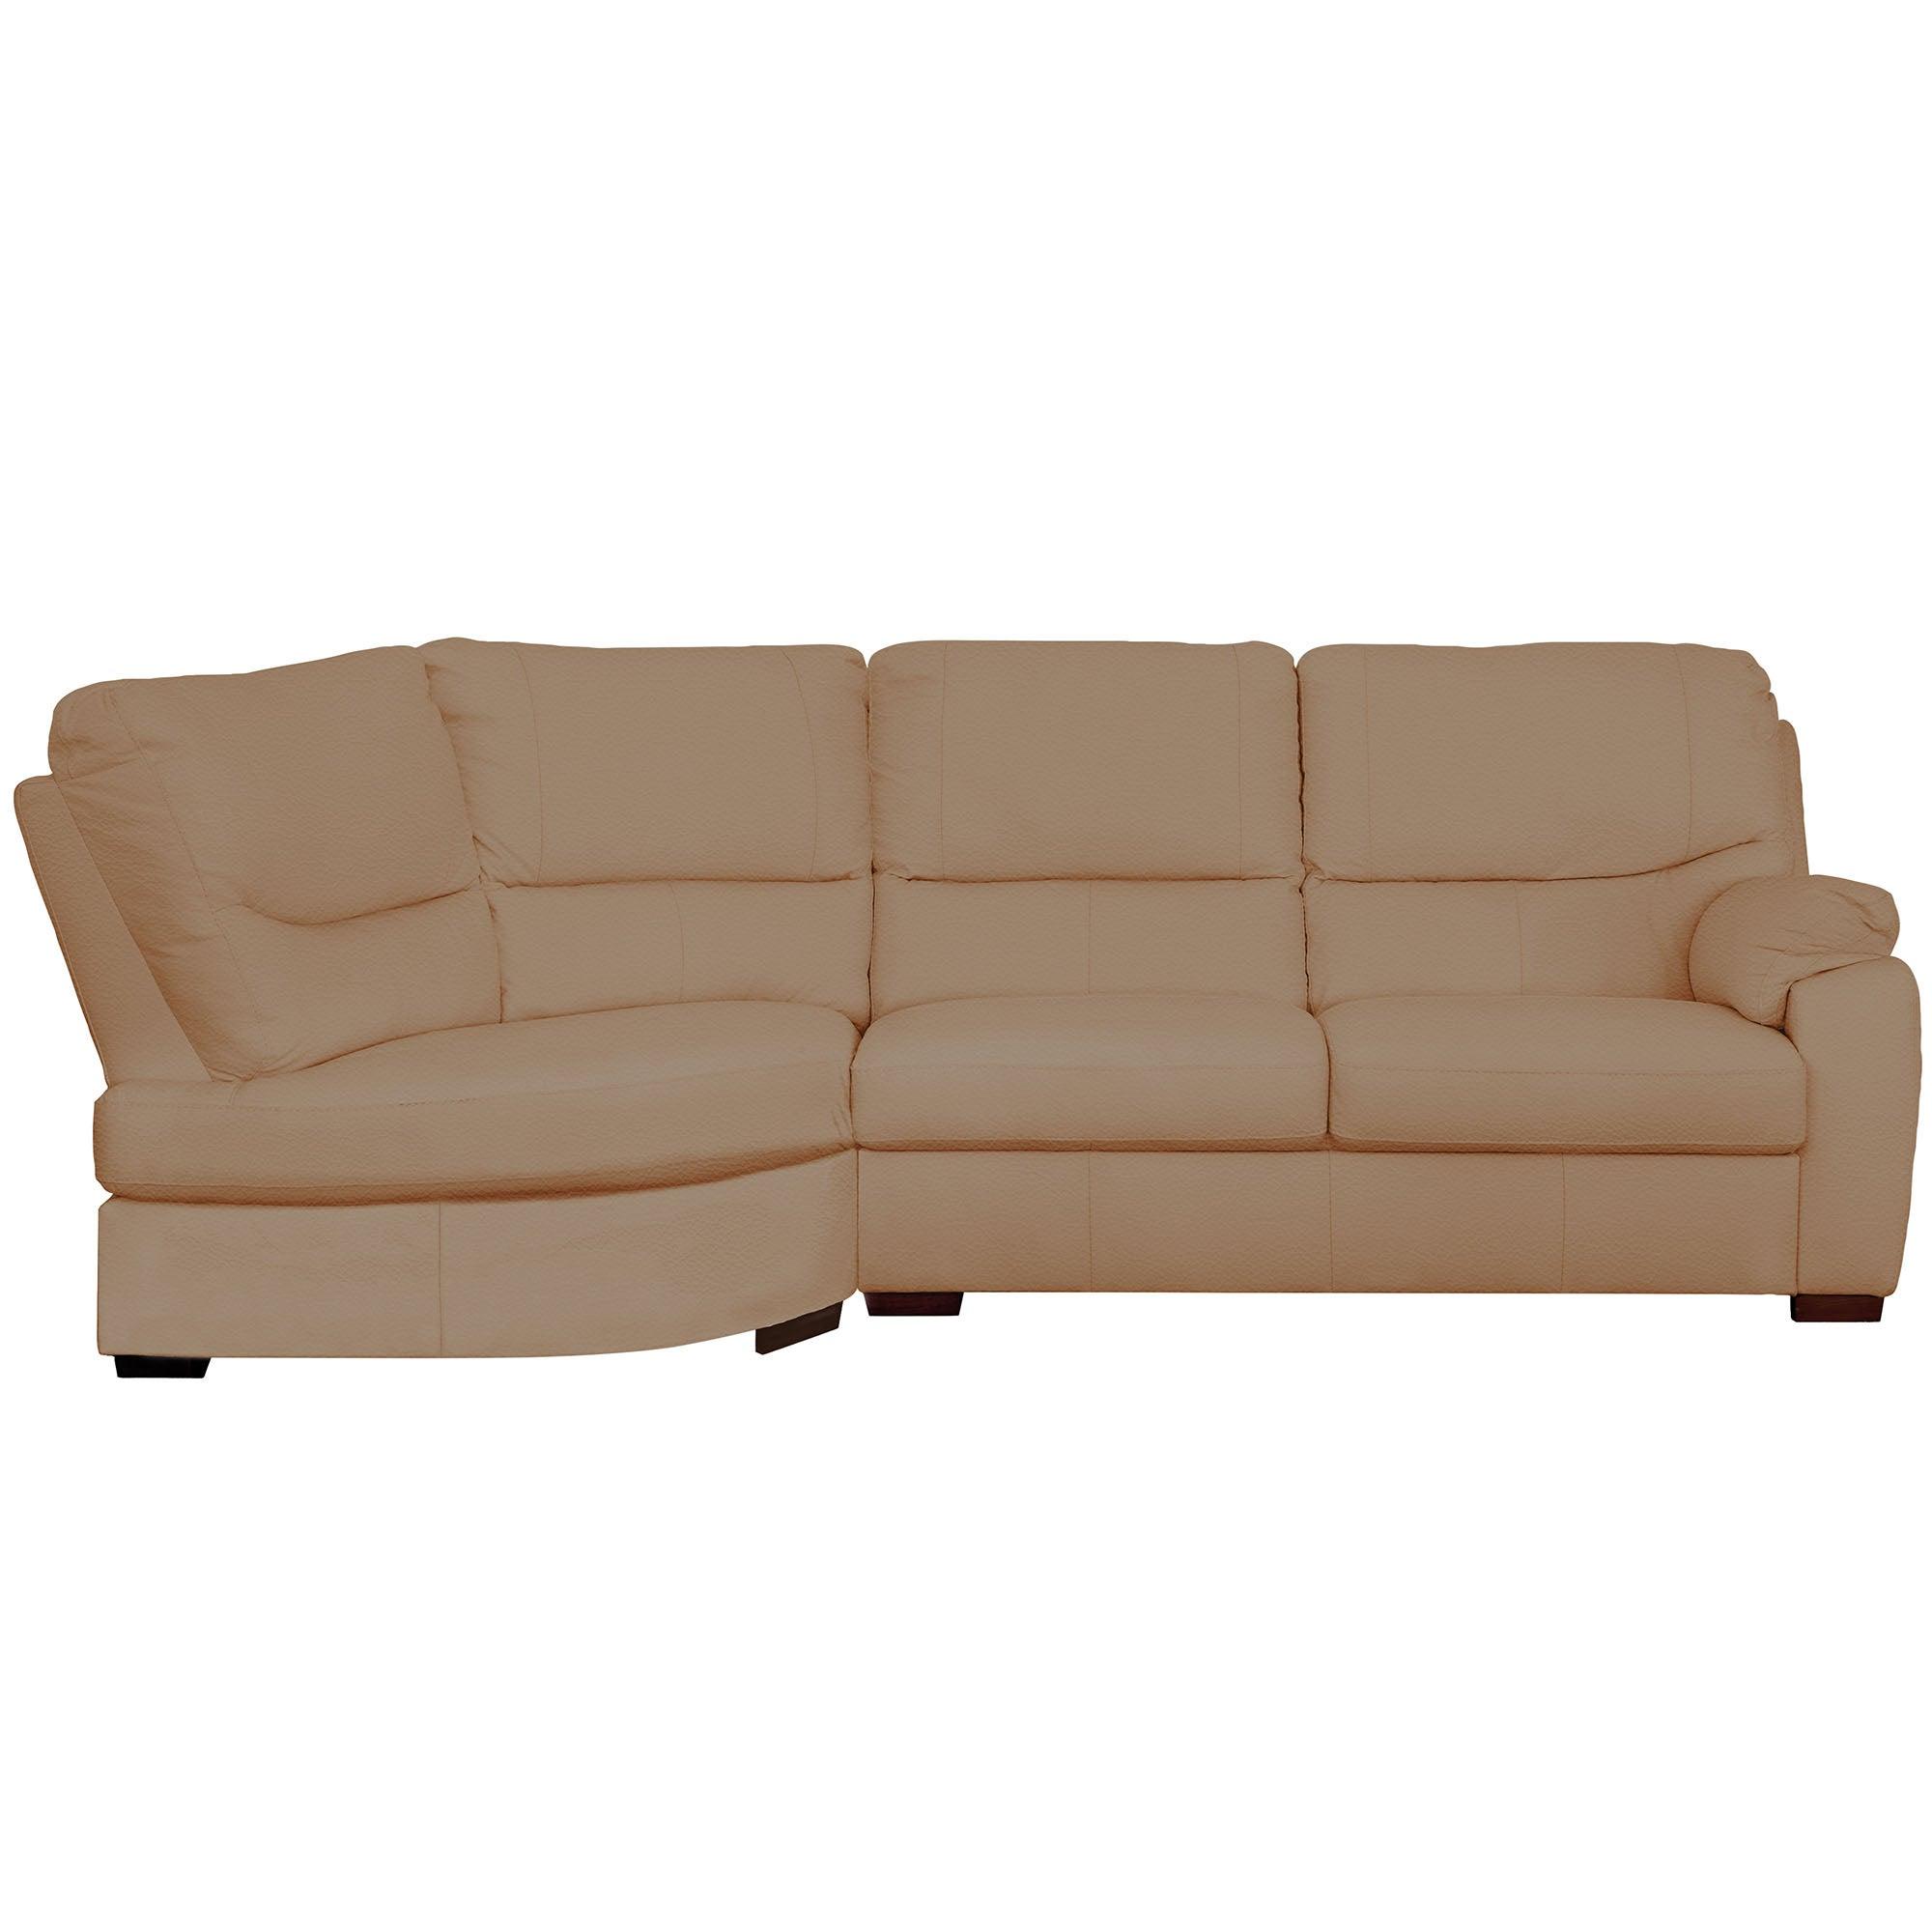 savannah corner chaise brown taupe. Black Bedroom Furniture Sets. Home Design Ideas